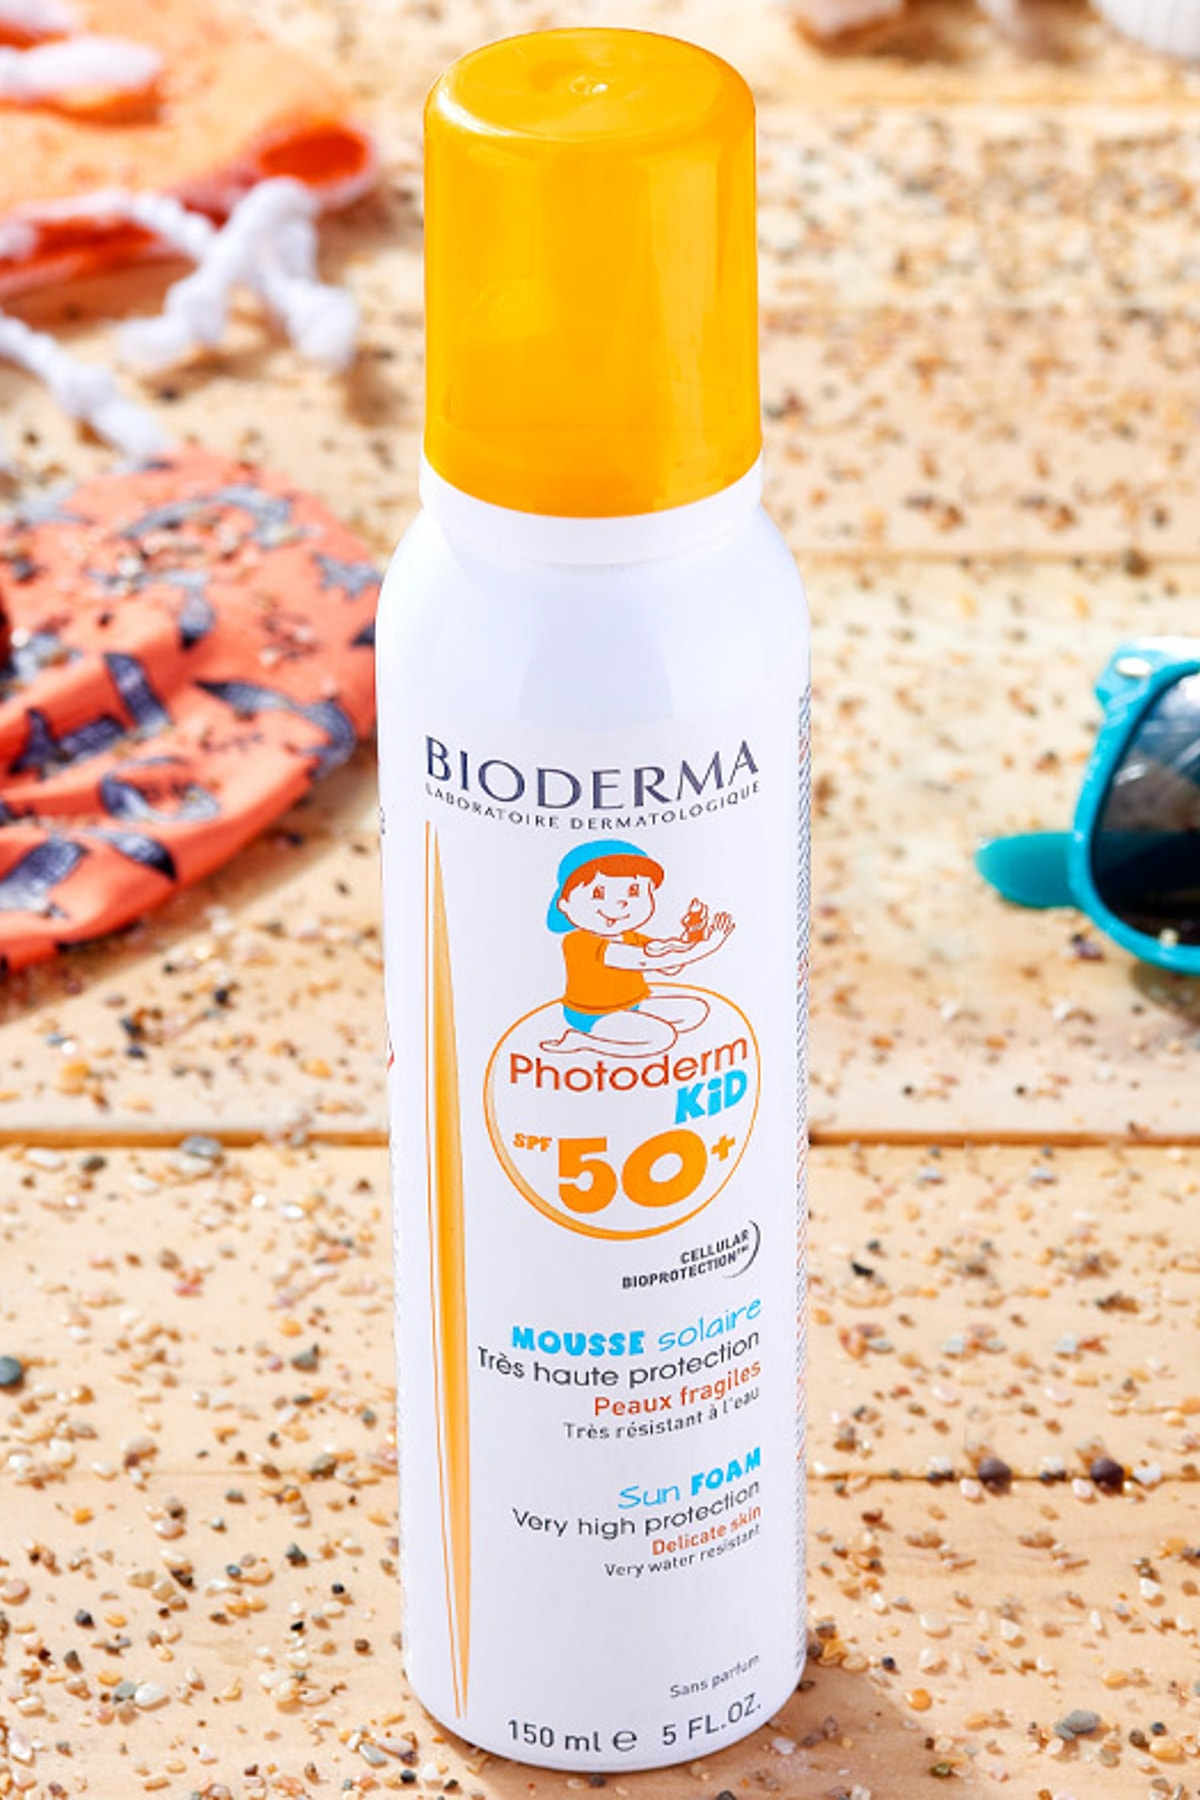 Bioderma Photoderm KID Mousse SPF 50+ 150 ml 2